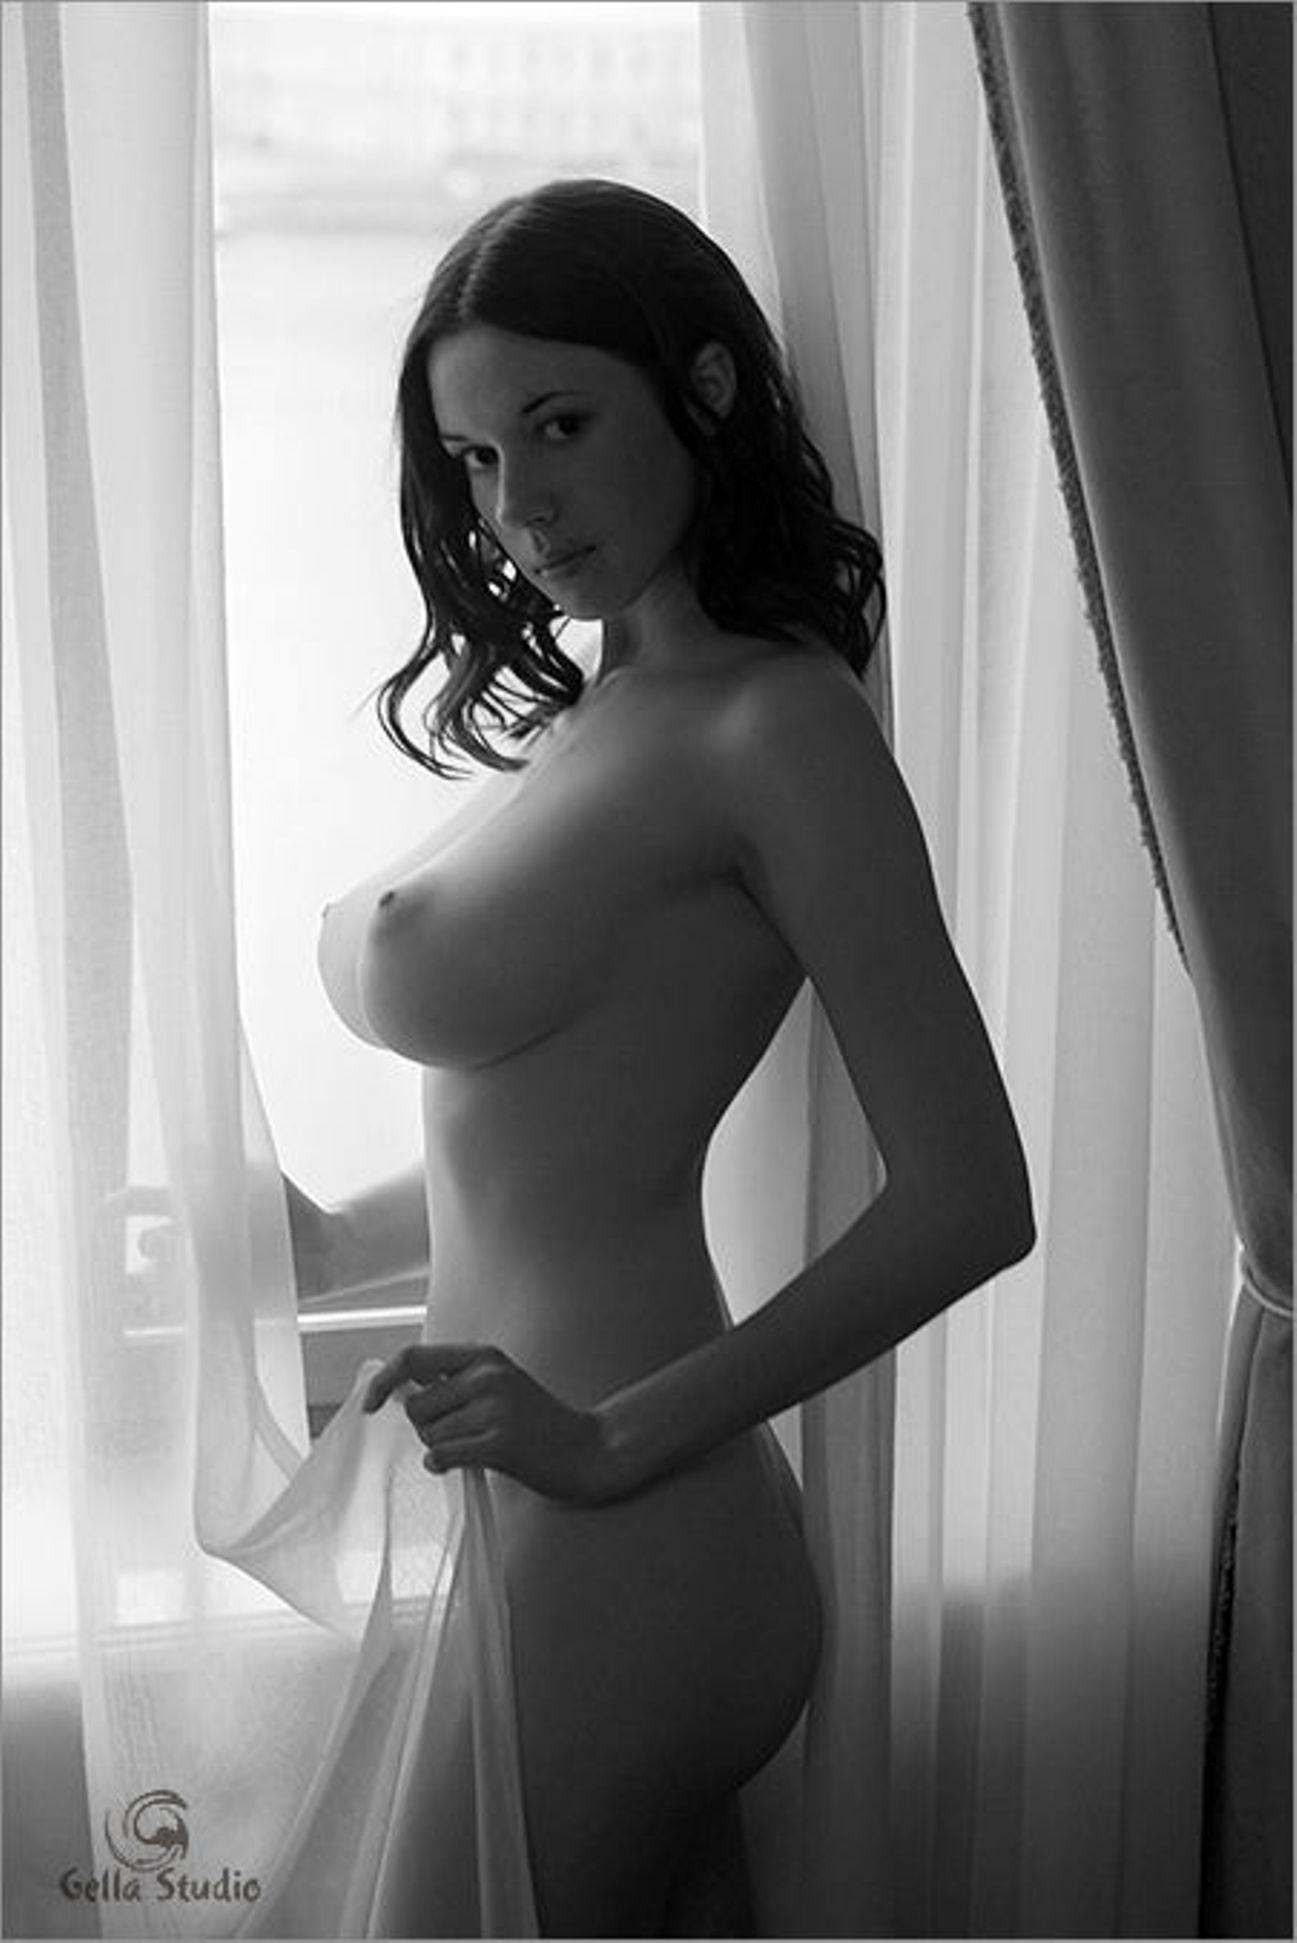 Superb tits